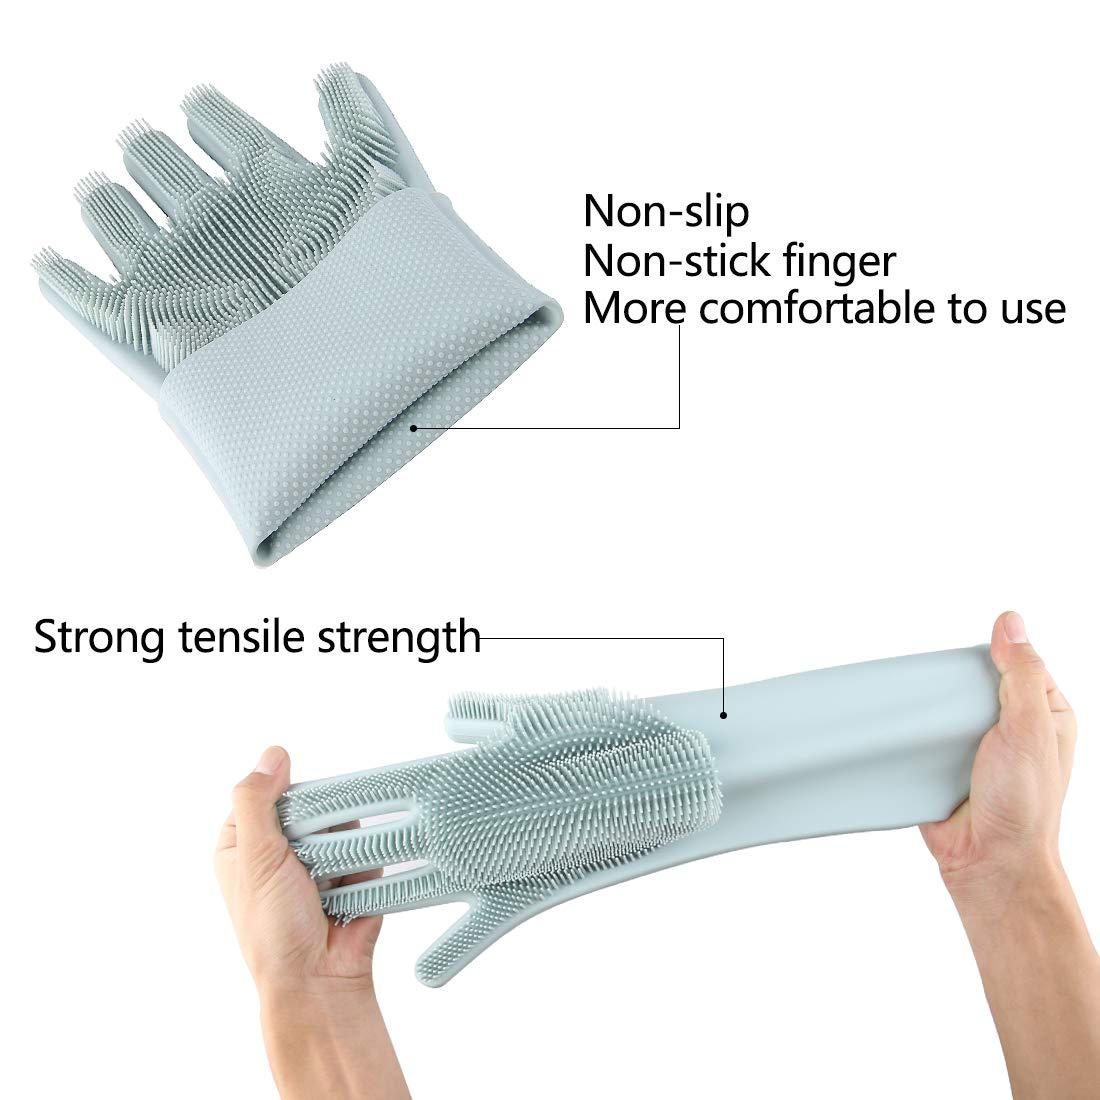 Bamboo Fiber Dishwashing Gloves Anti-oil for Kitchen Cleaning Hanging Gloves